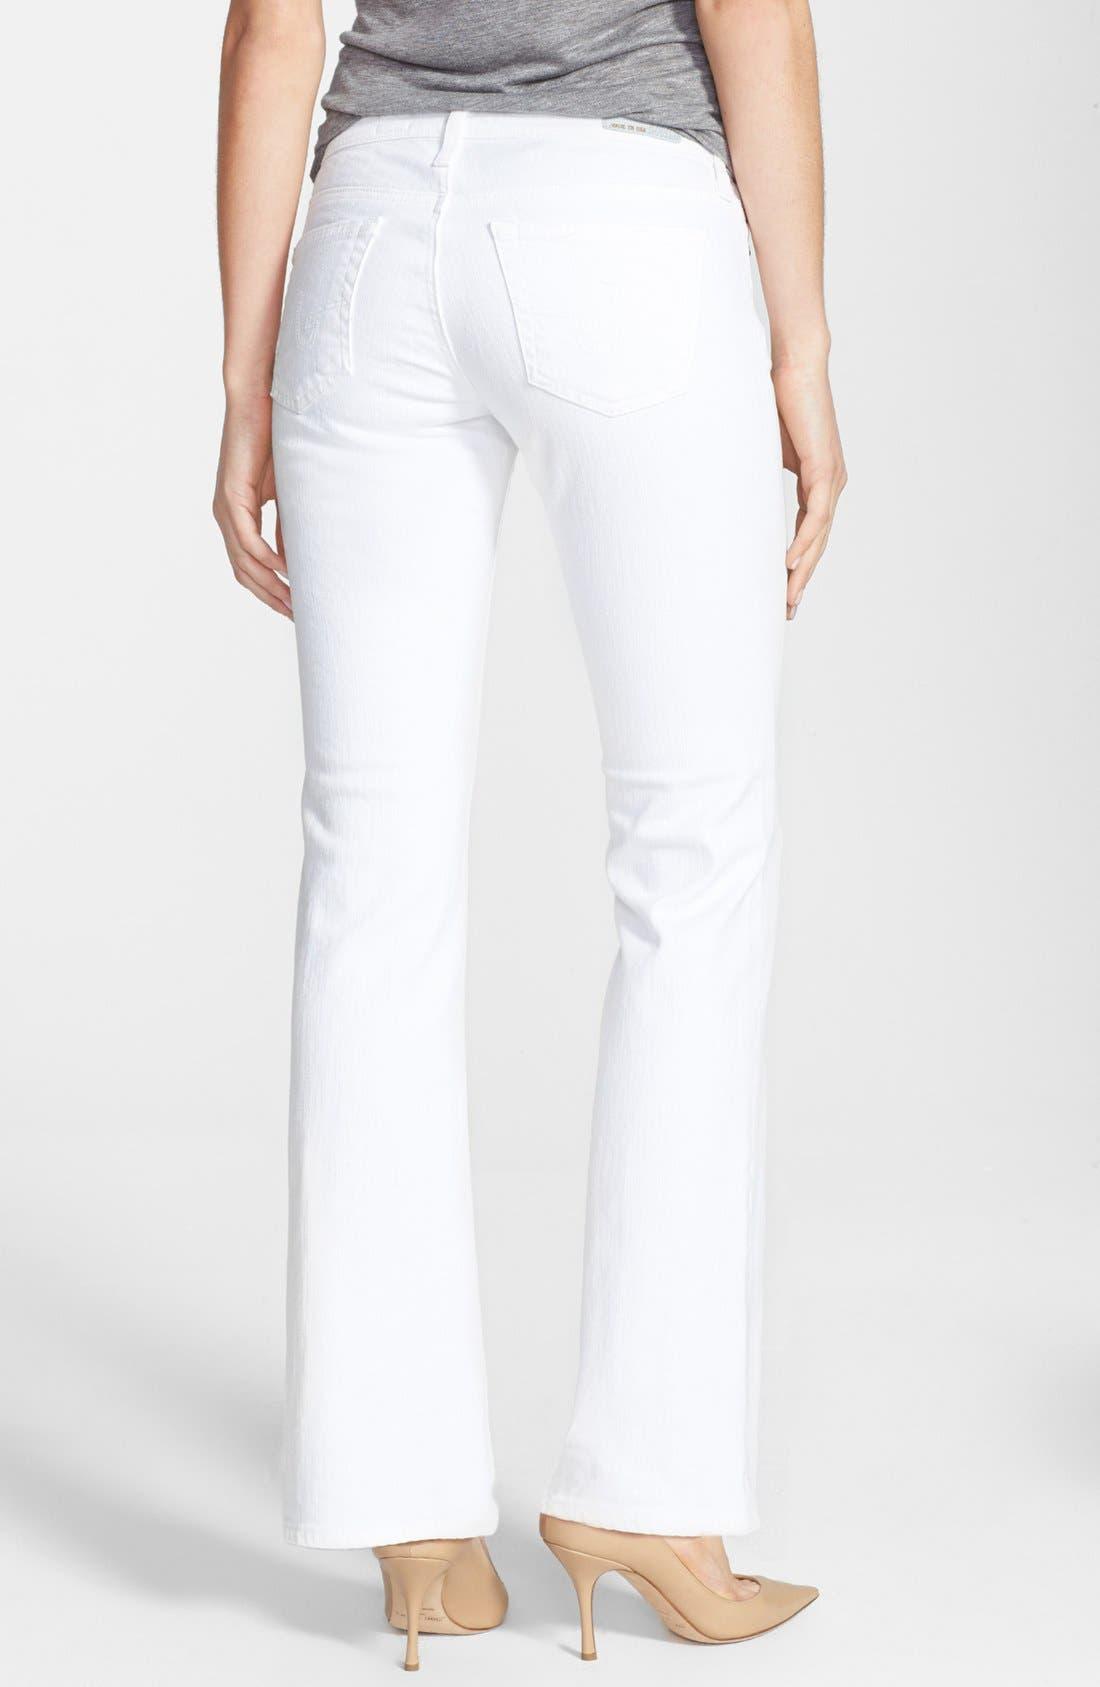 Alternate Image 2  - AG 'Angelina' Bootcut Jeans (Petite) (White)